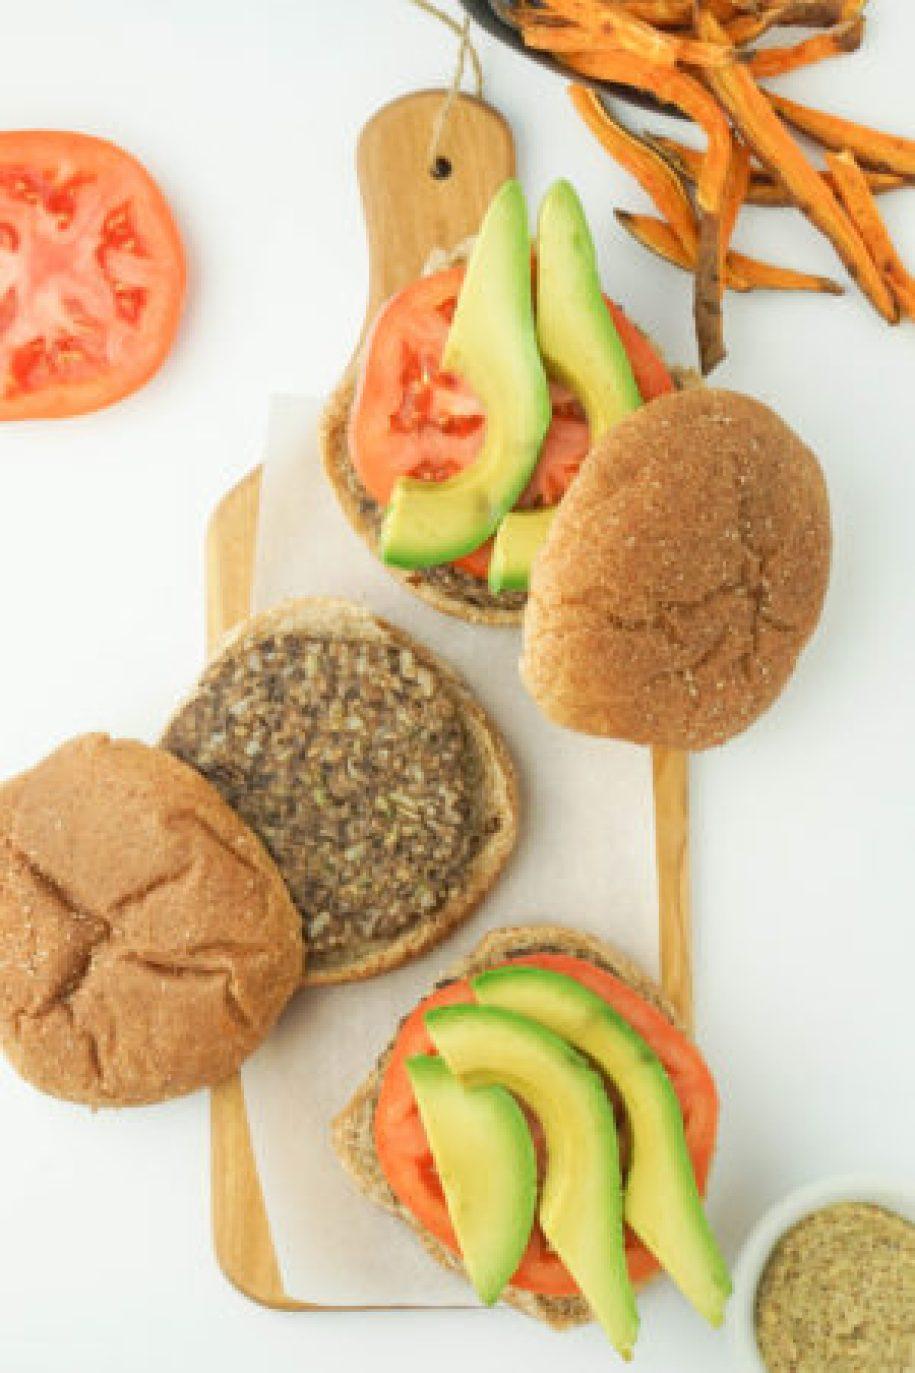 Healthy Vegan Black Bean Burgers! Super EASY and super delicious! #healthy #burgers #veggieburgers #recipe #blackbeanburgers #brownrice | www.wakeuptowaffles.com